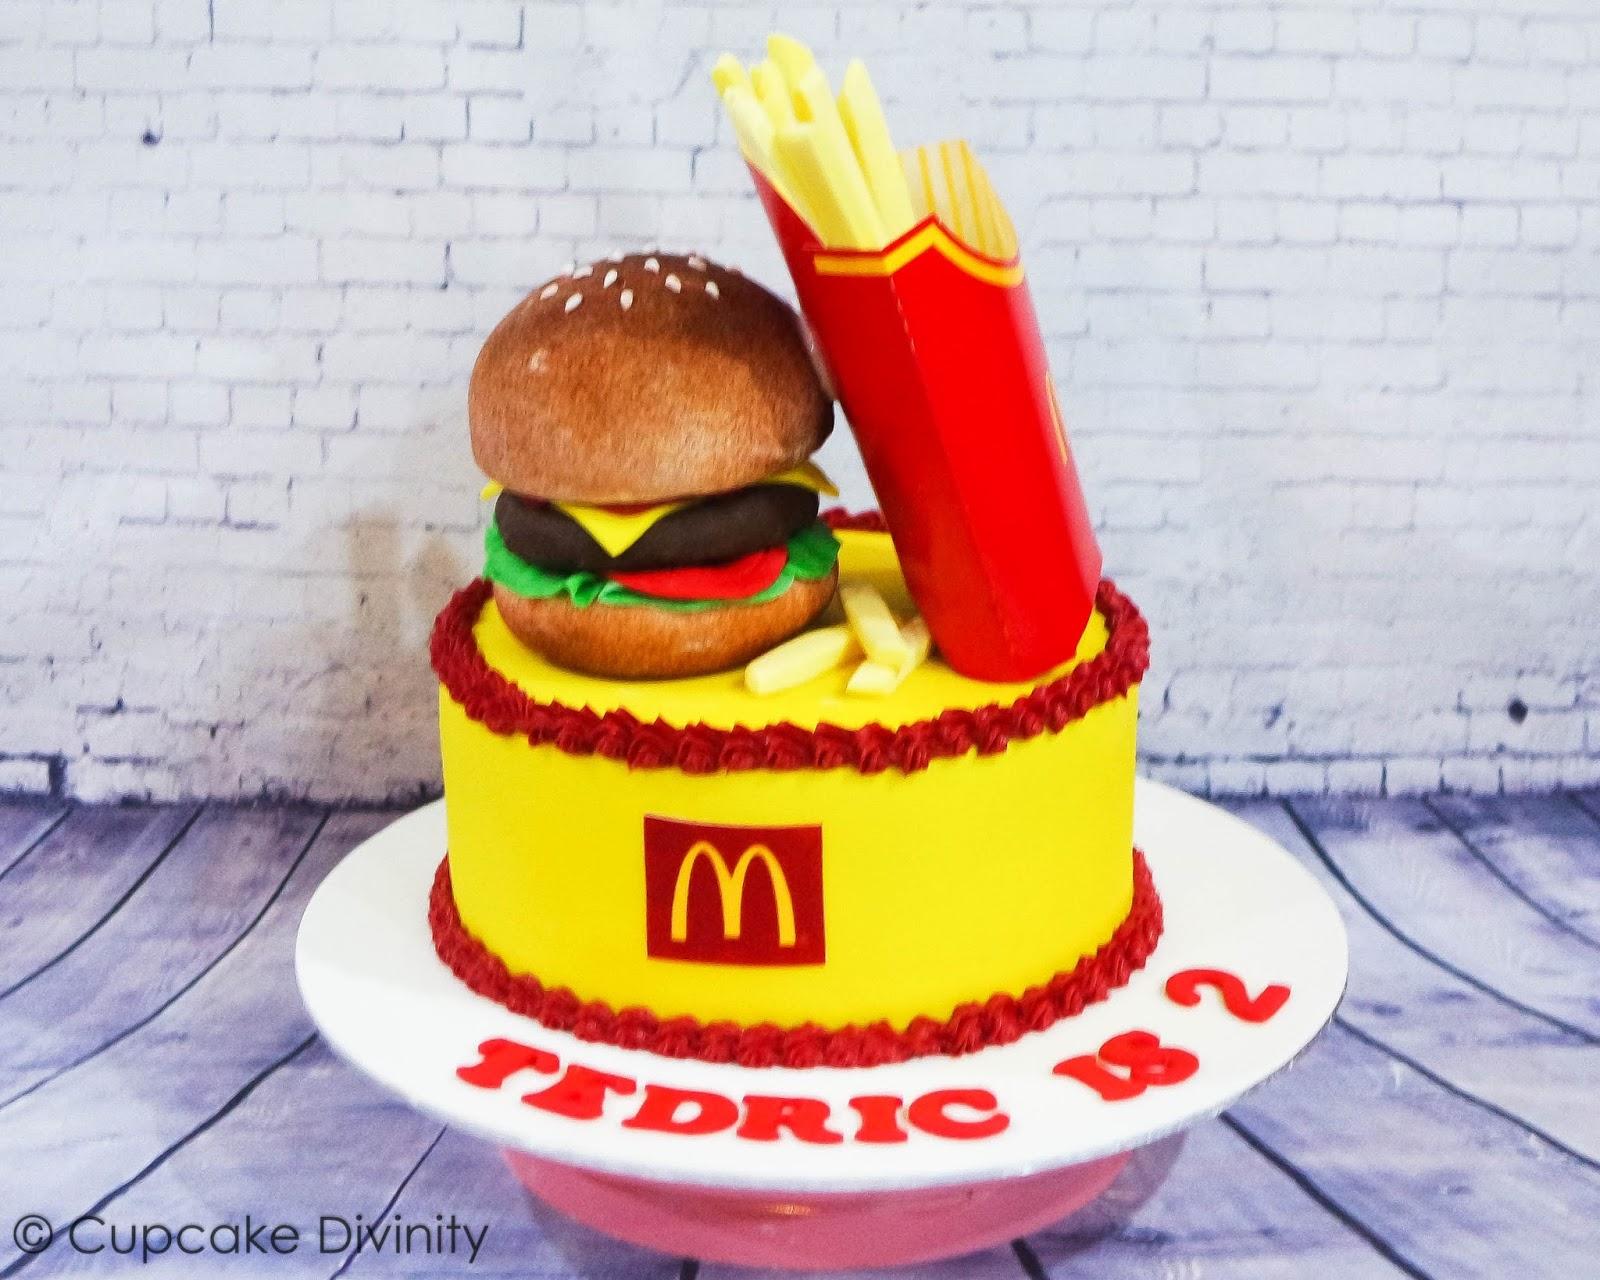 Cupcake Divinity Mcdonalds Hamburger Fries Set Cake